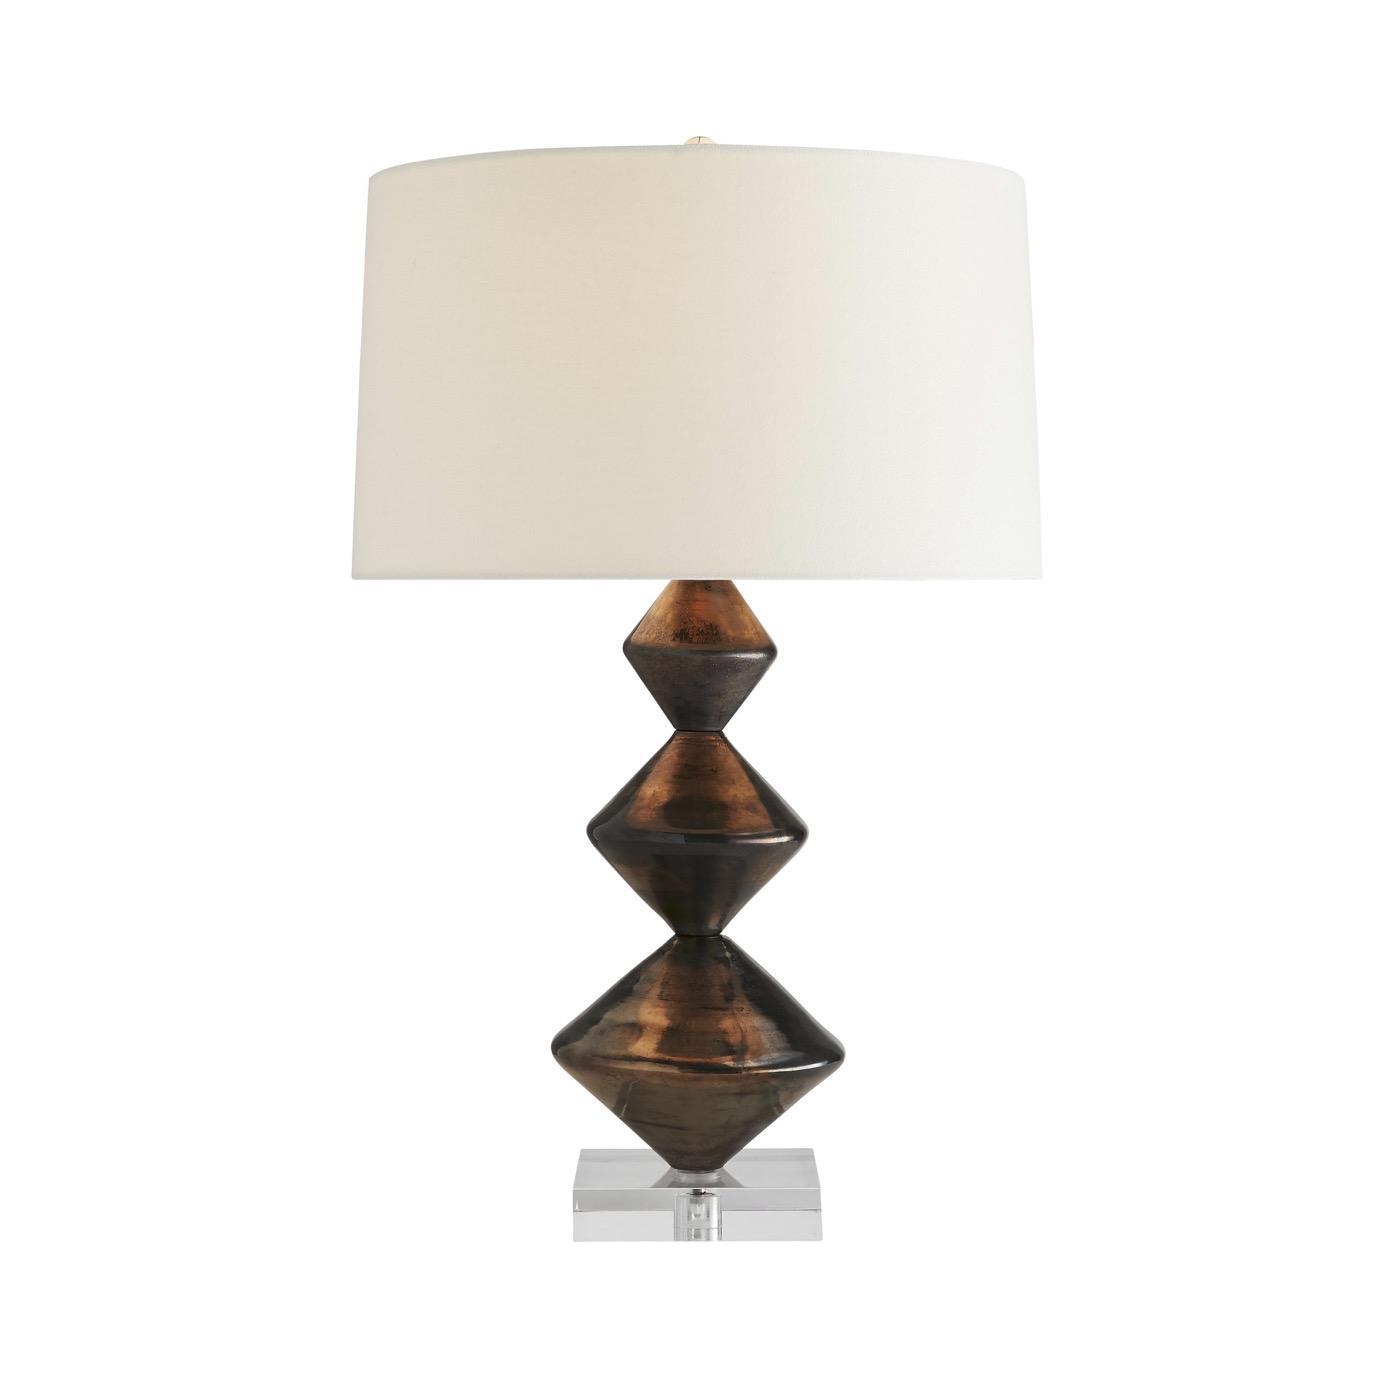 Patrick Glass Table Lamp